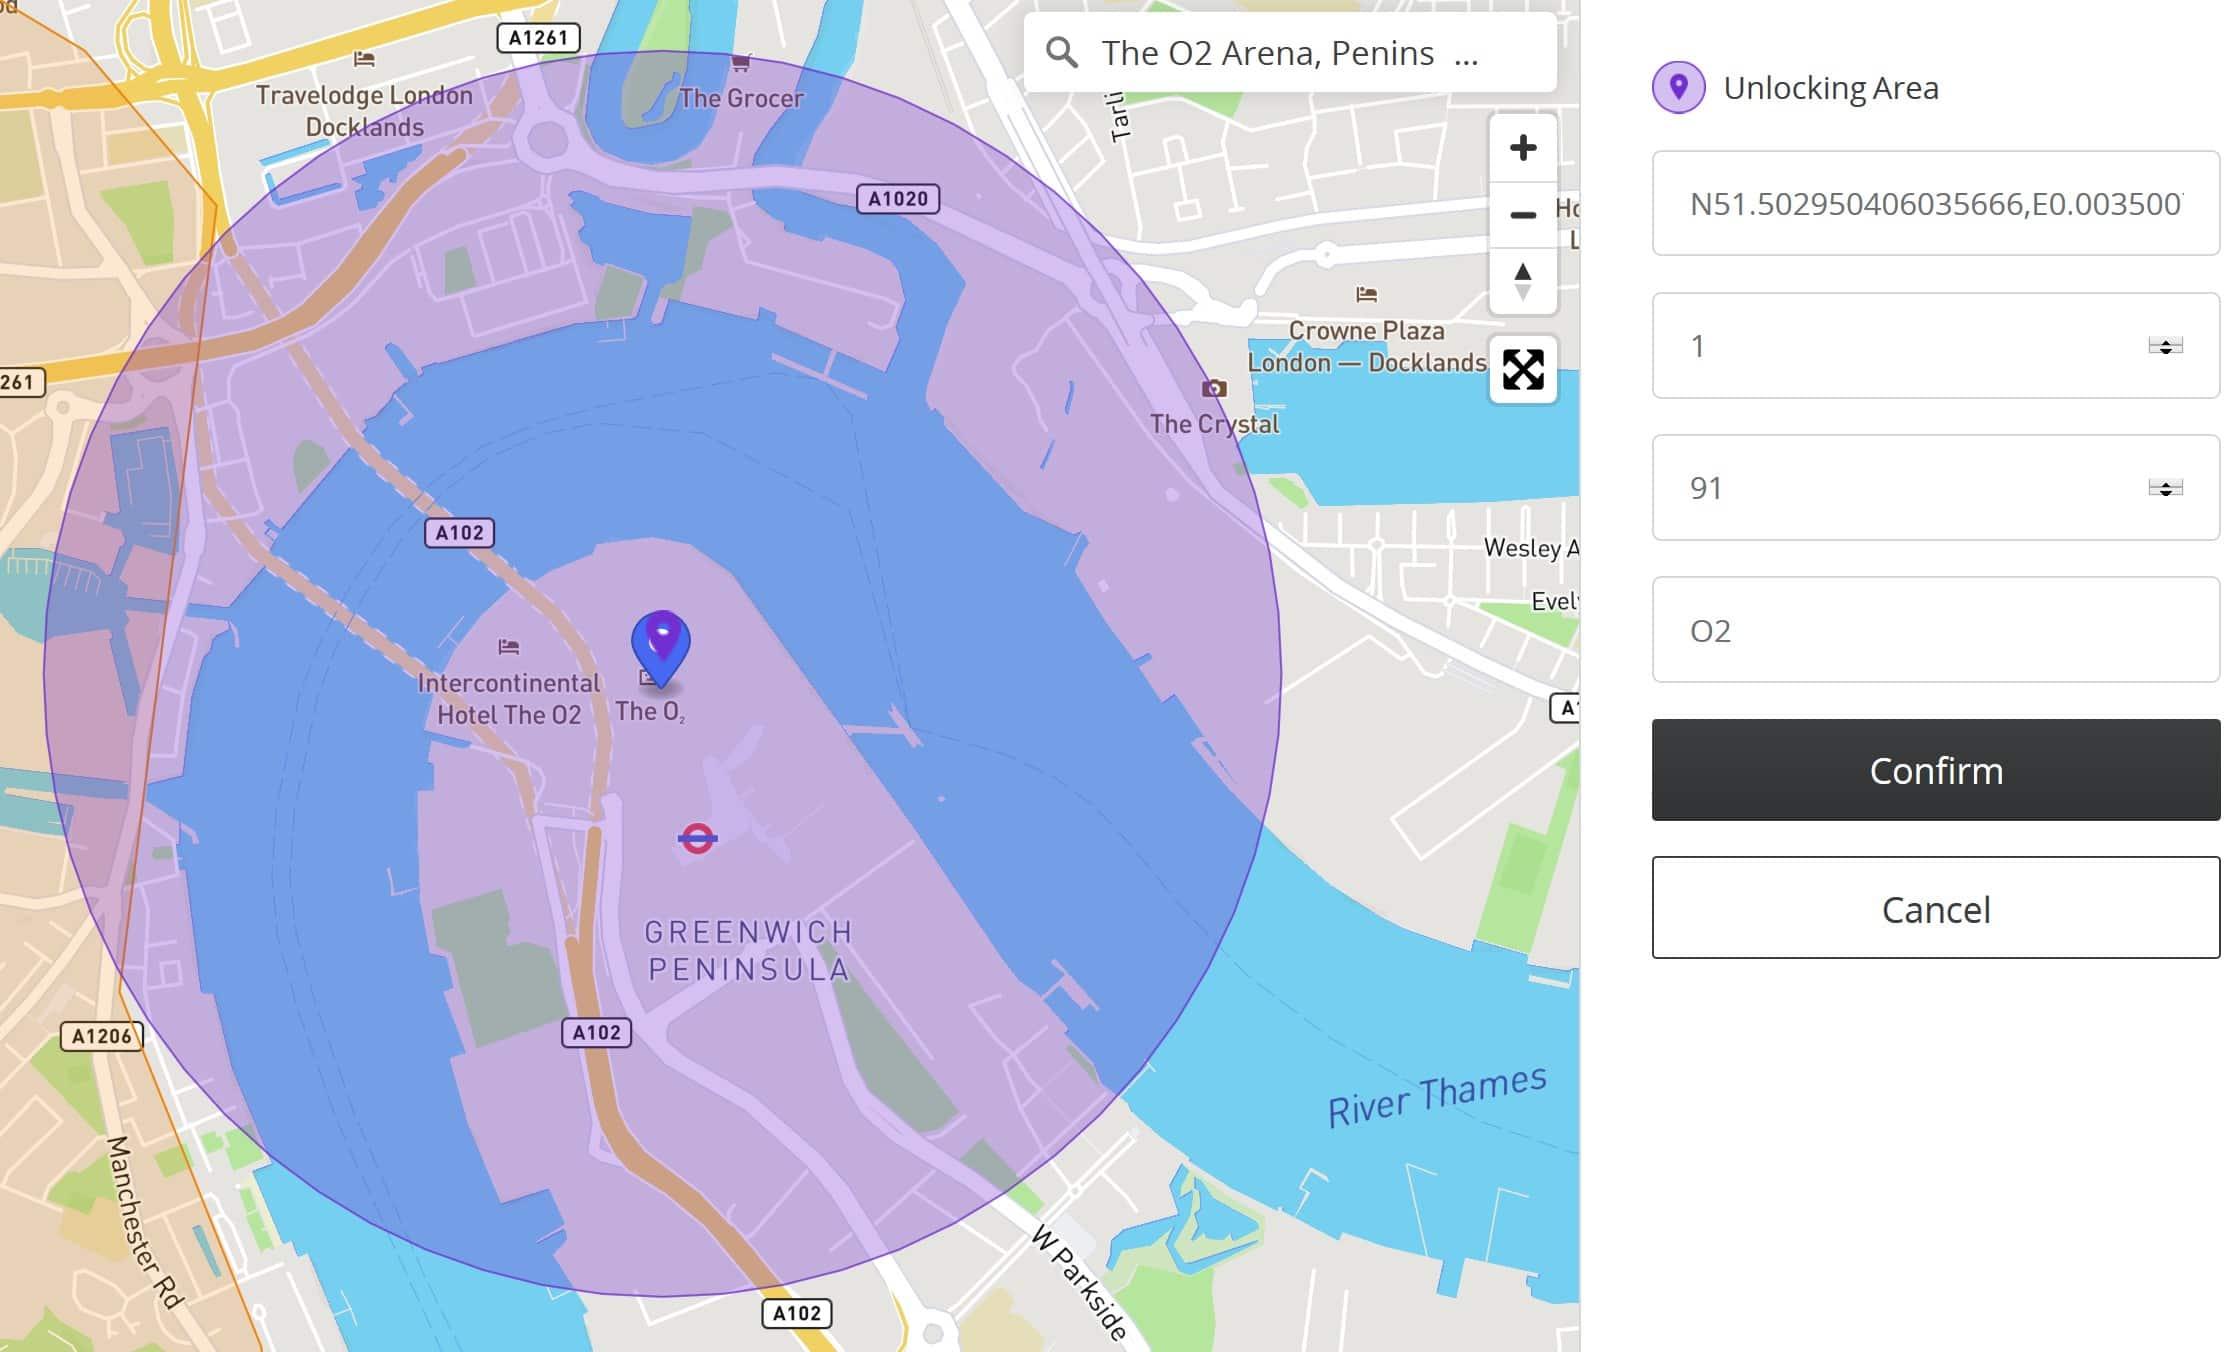 O2 area unlocking request